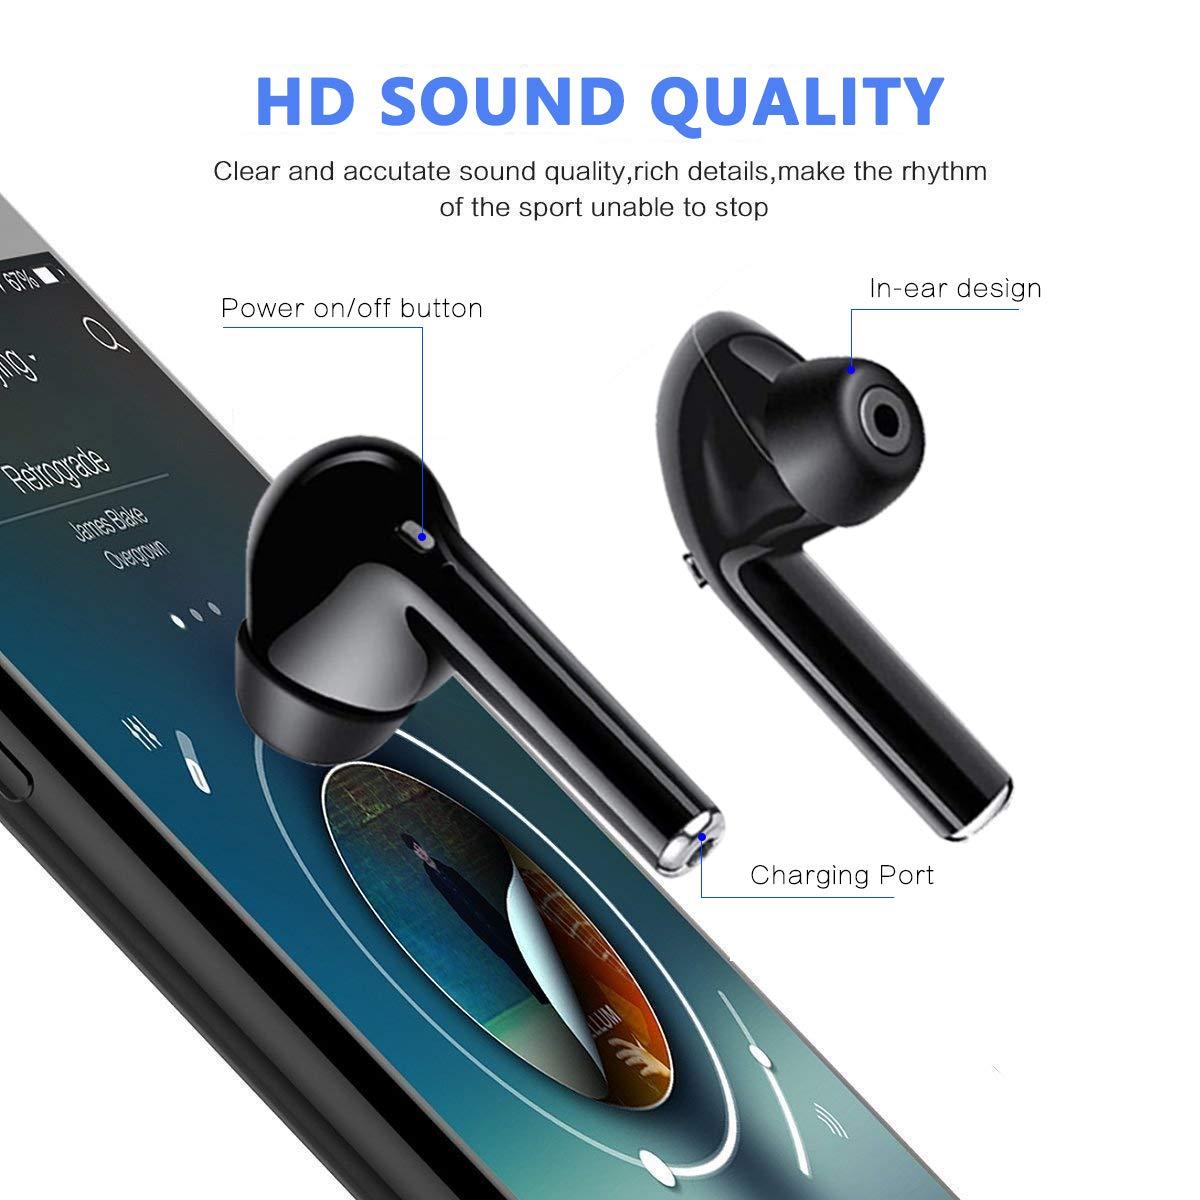 Auricolari Bluetooth 5.0,Salipt Cuffie Bluetooth Auricolari Wireless Stereo Senza Fili Sportivi in Ear con Custodia da Ricarica Microfono Leggeri Hi-Fi Cuffie per Samsung iPhone iPad Huawei Sony HTC